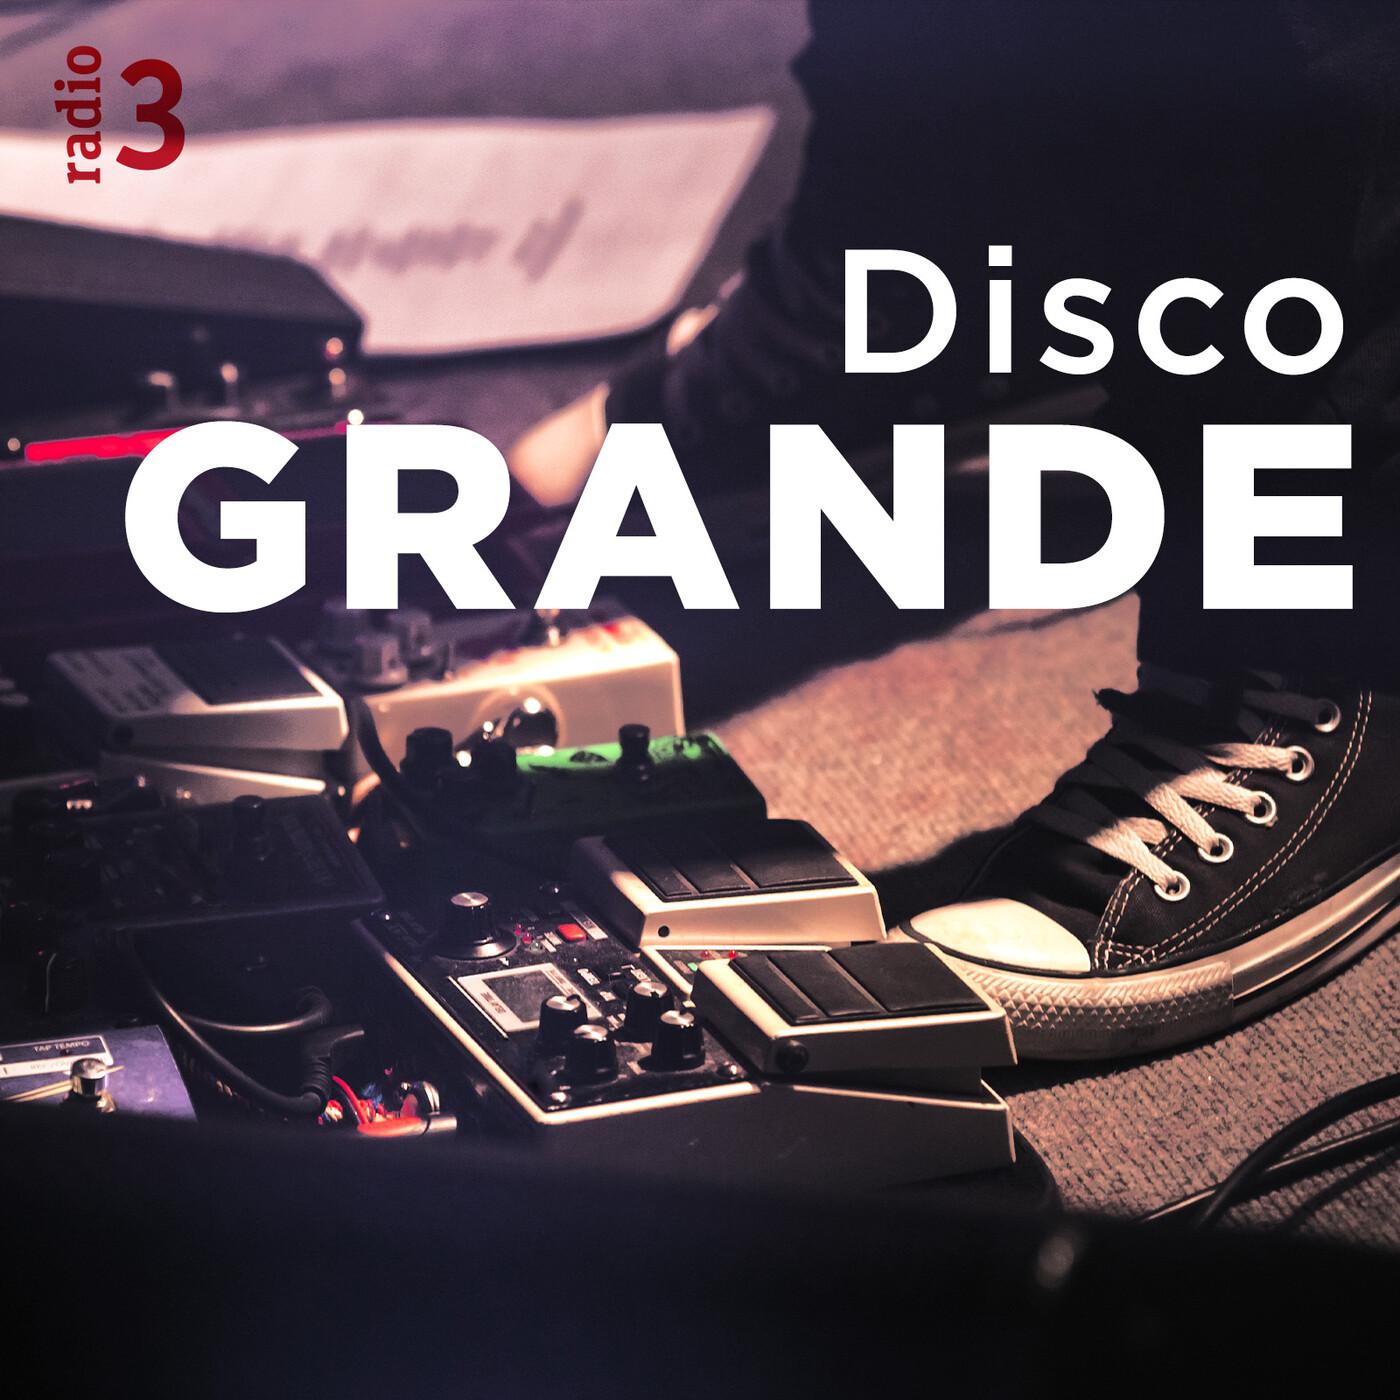 Disco Grande